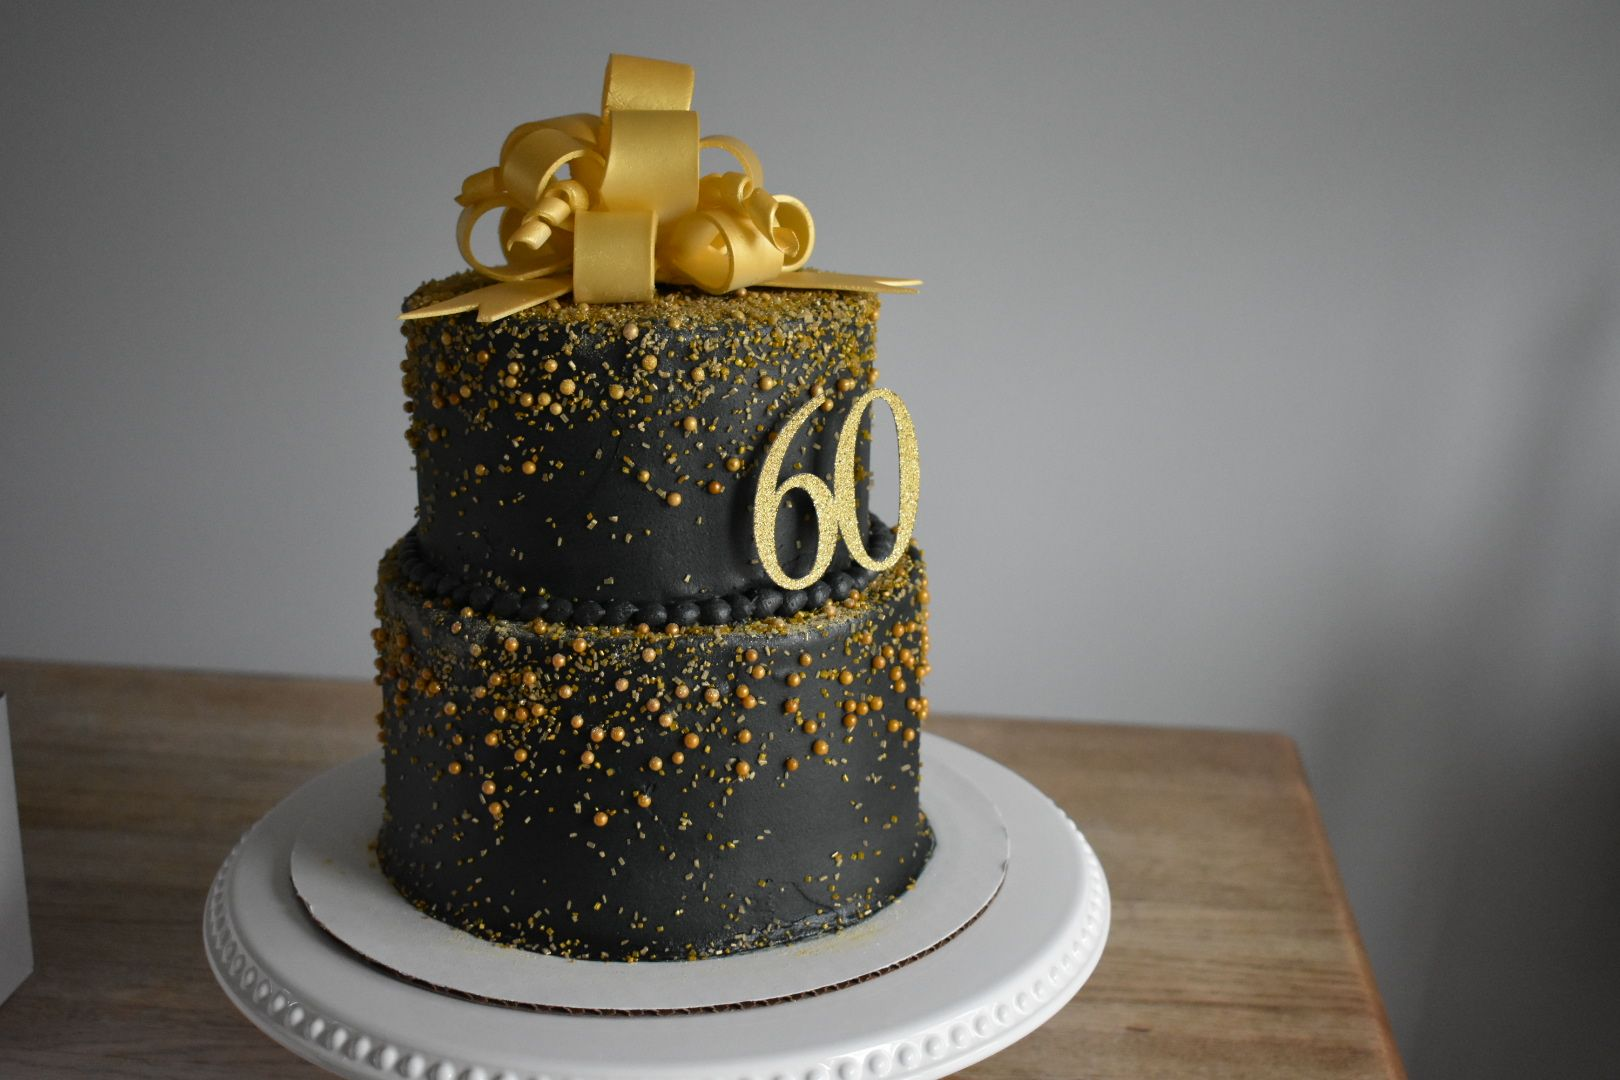 60th Birthday Cake Black And Gold Cake Birthday Cake For Him